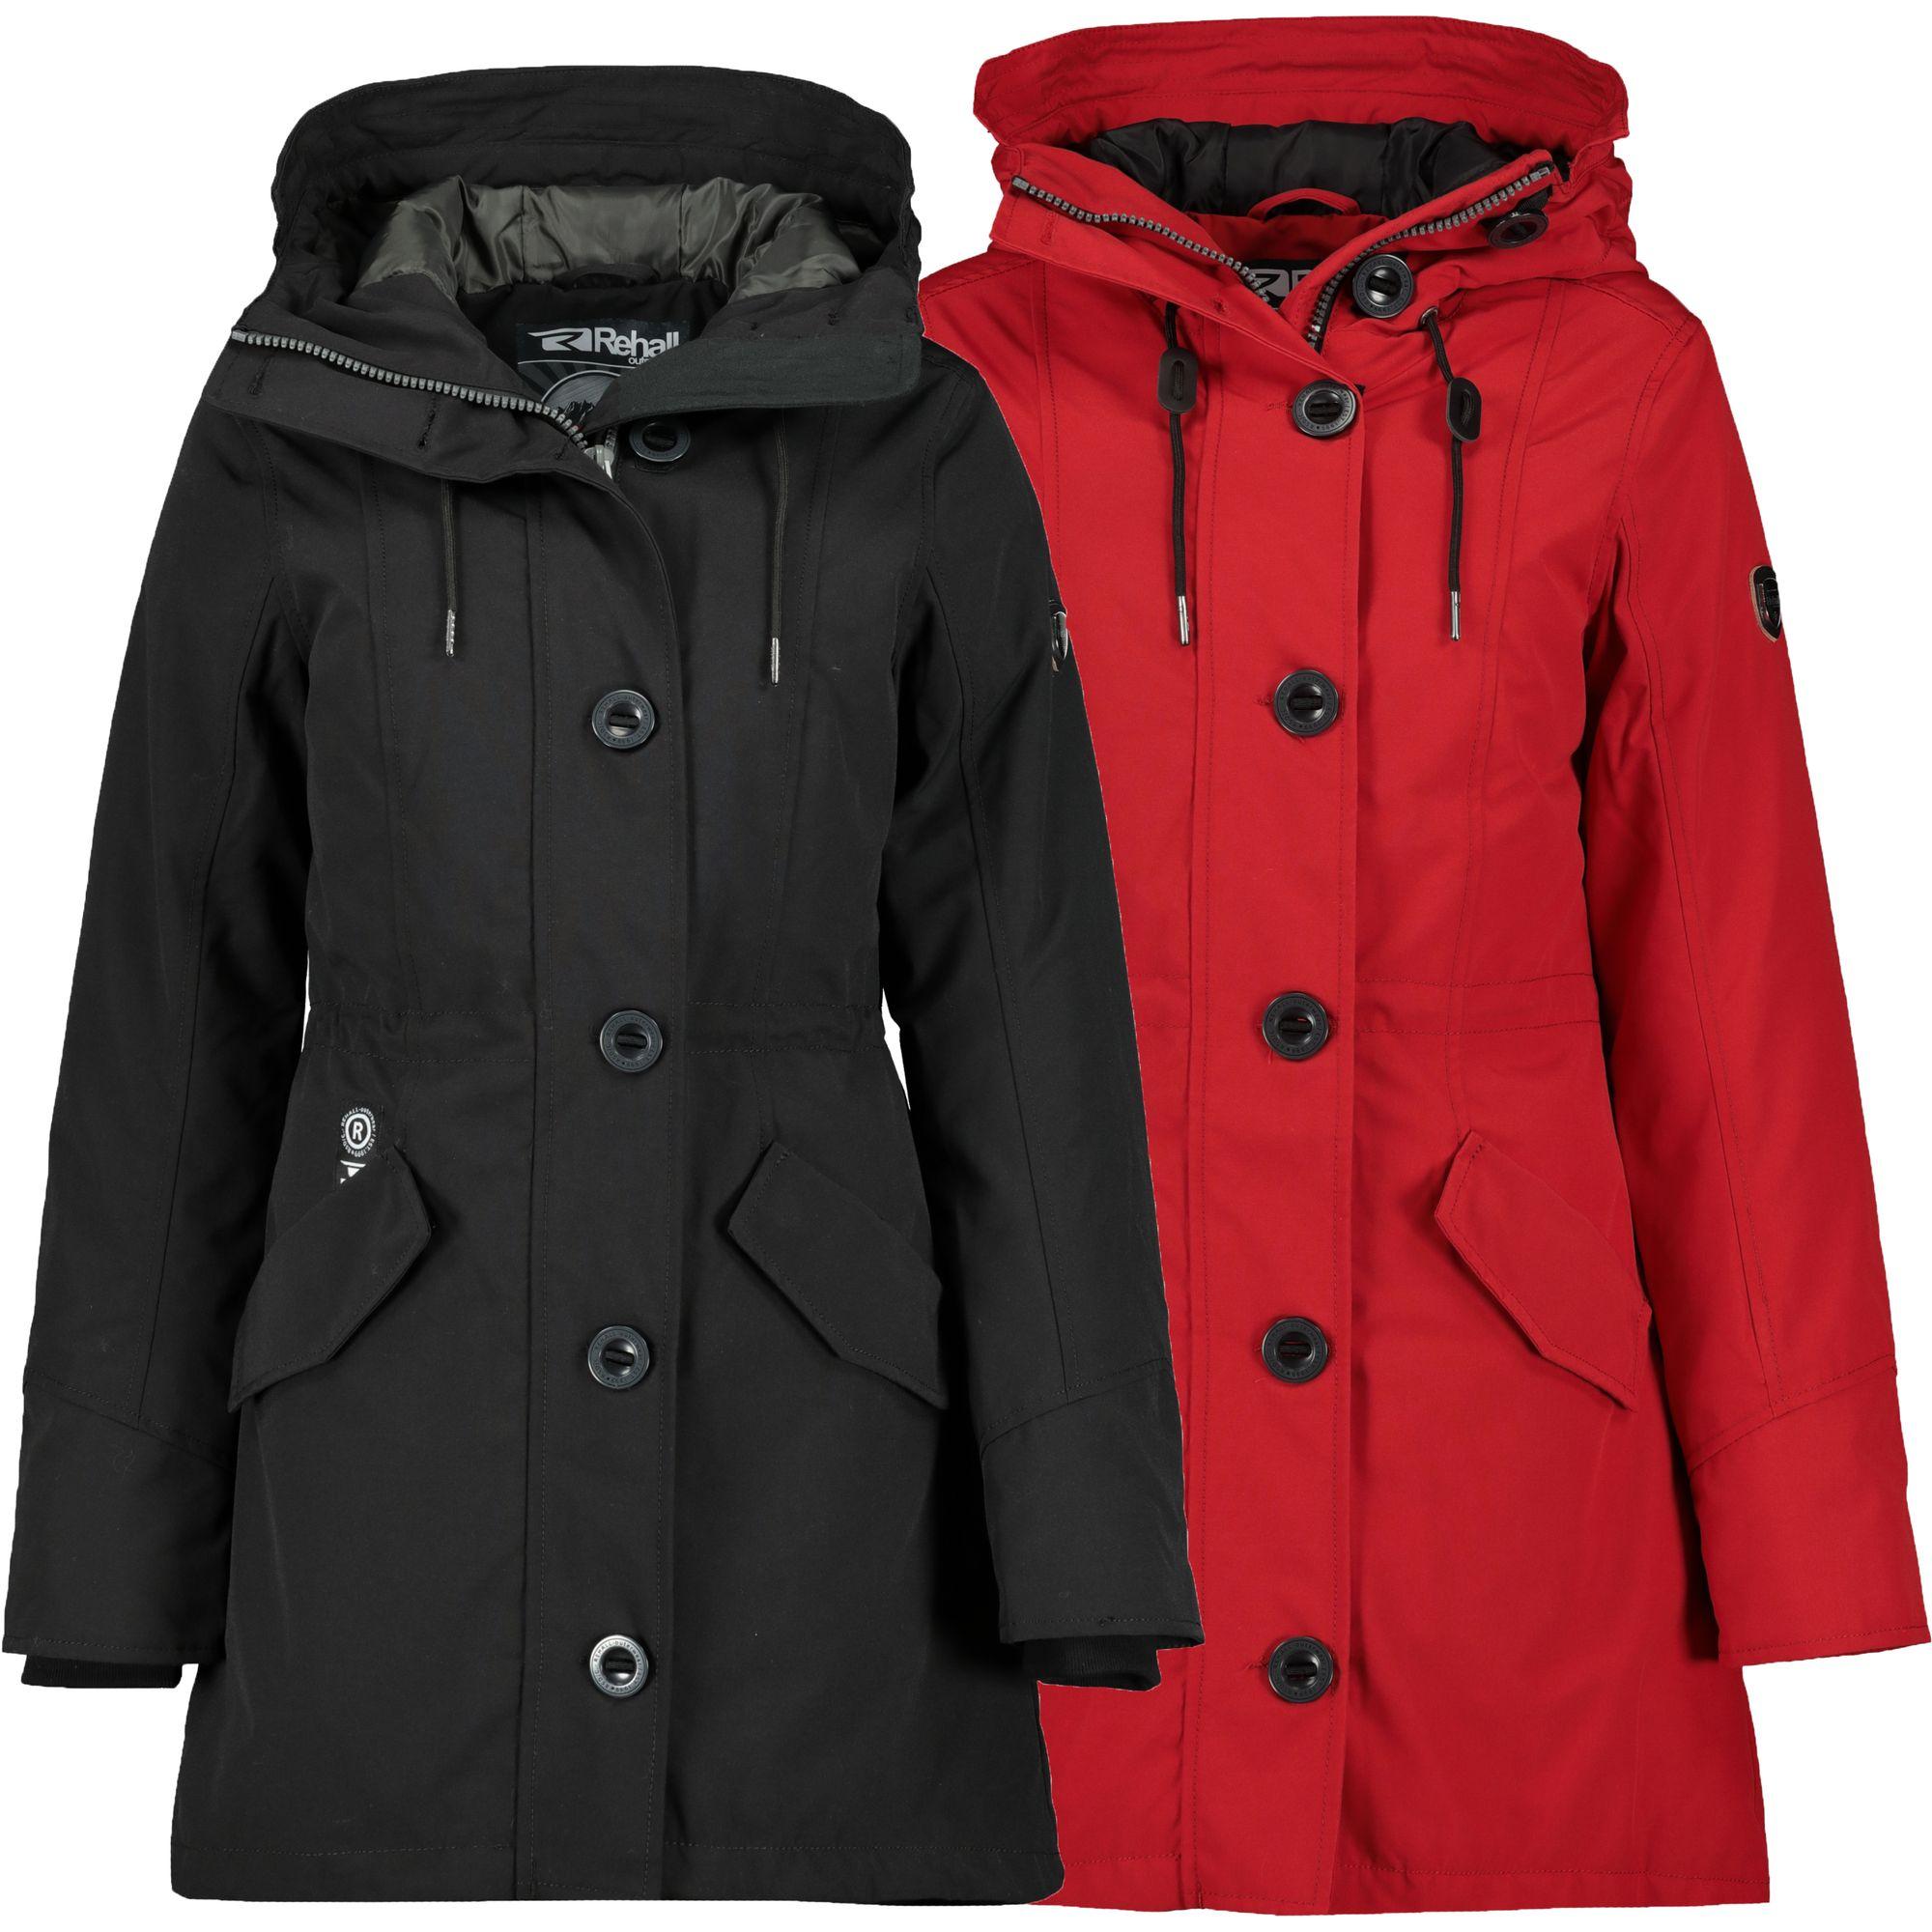 Damen Rehall Jacke Mantel R Zu Daynah Details Wintermantel Outdoormantel mnyv0N8wO